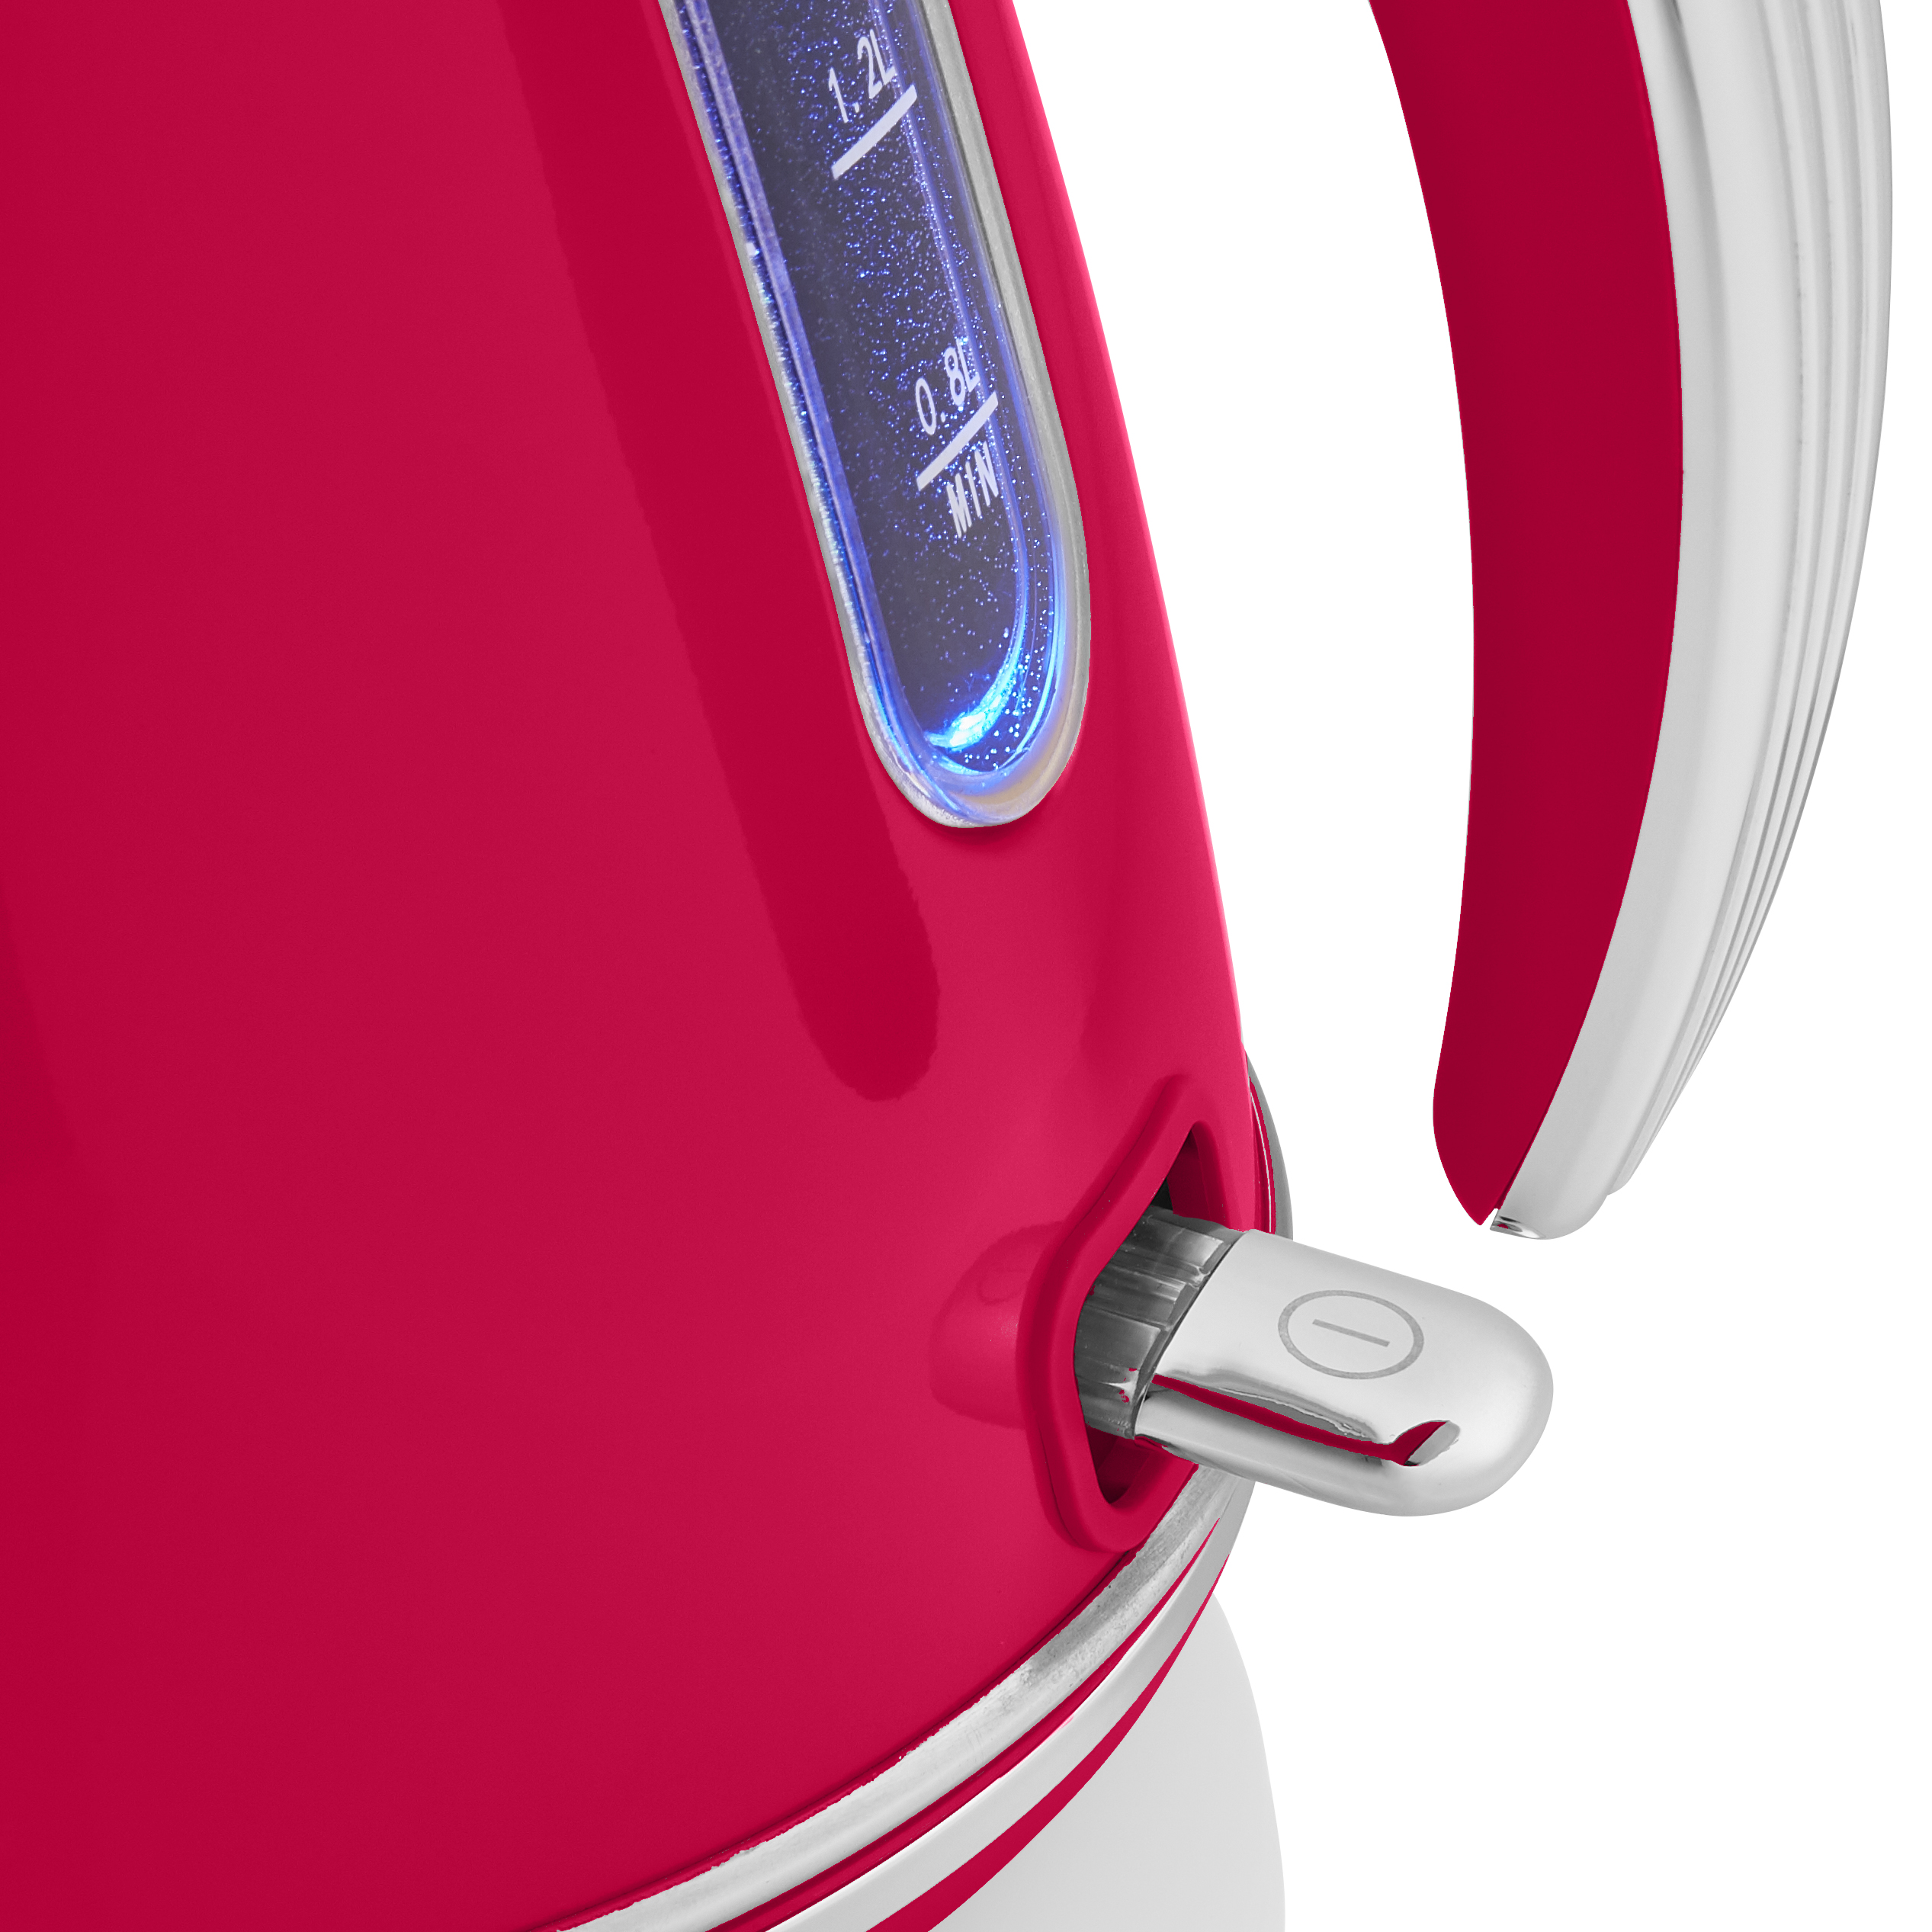 thumbnail 100 - Swan Retro 1.5L Jug Kettle 3KW, 2 Slice Toaster 815W & 20L Digital Microwave Set